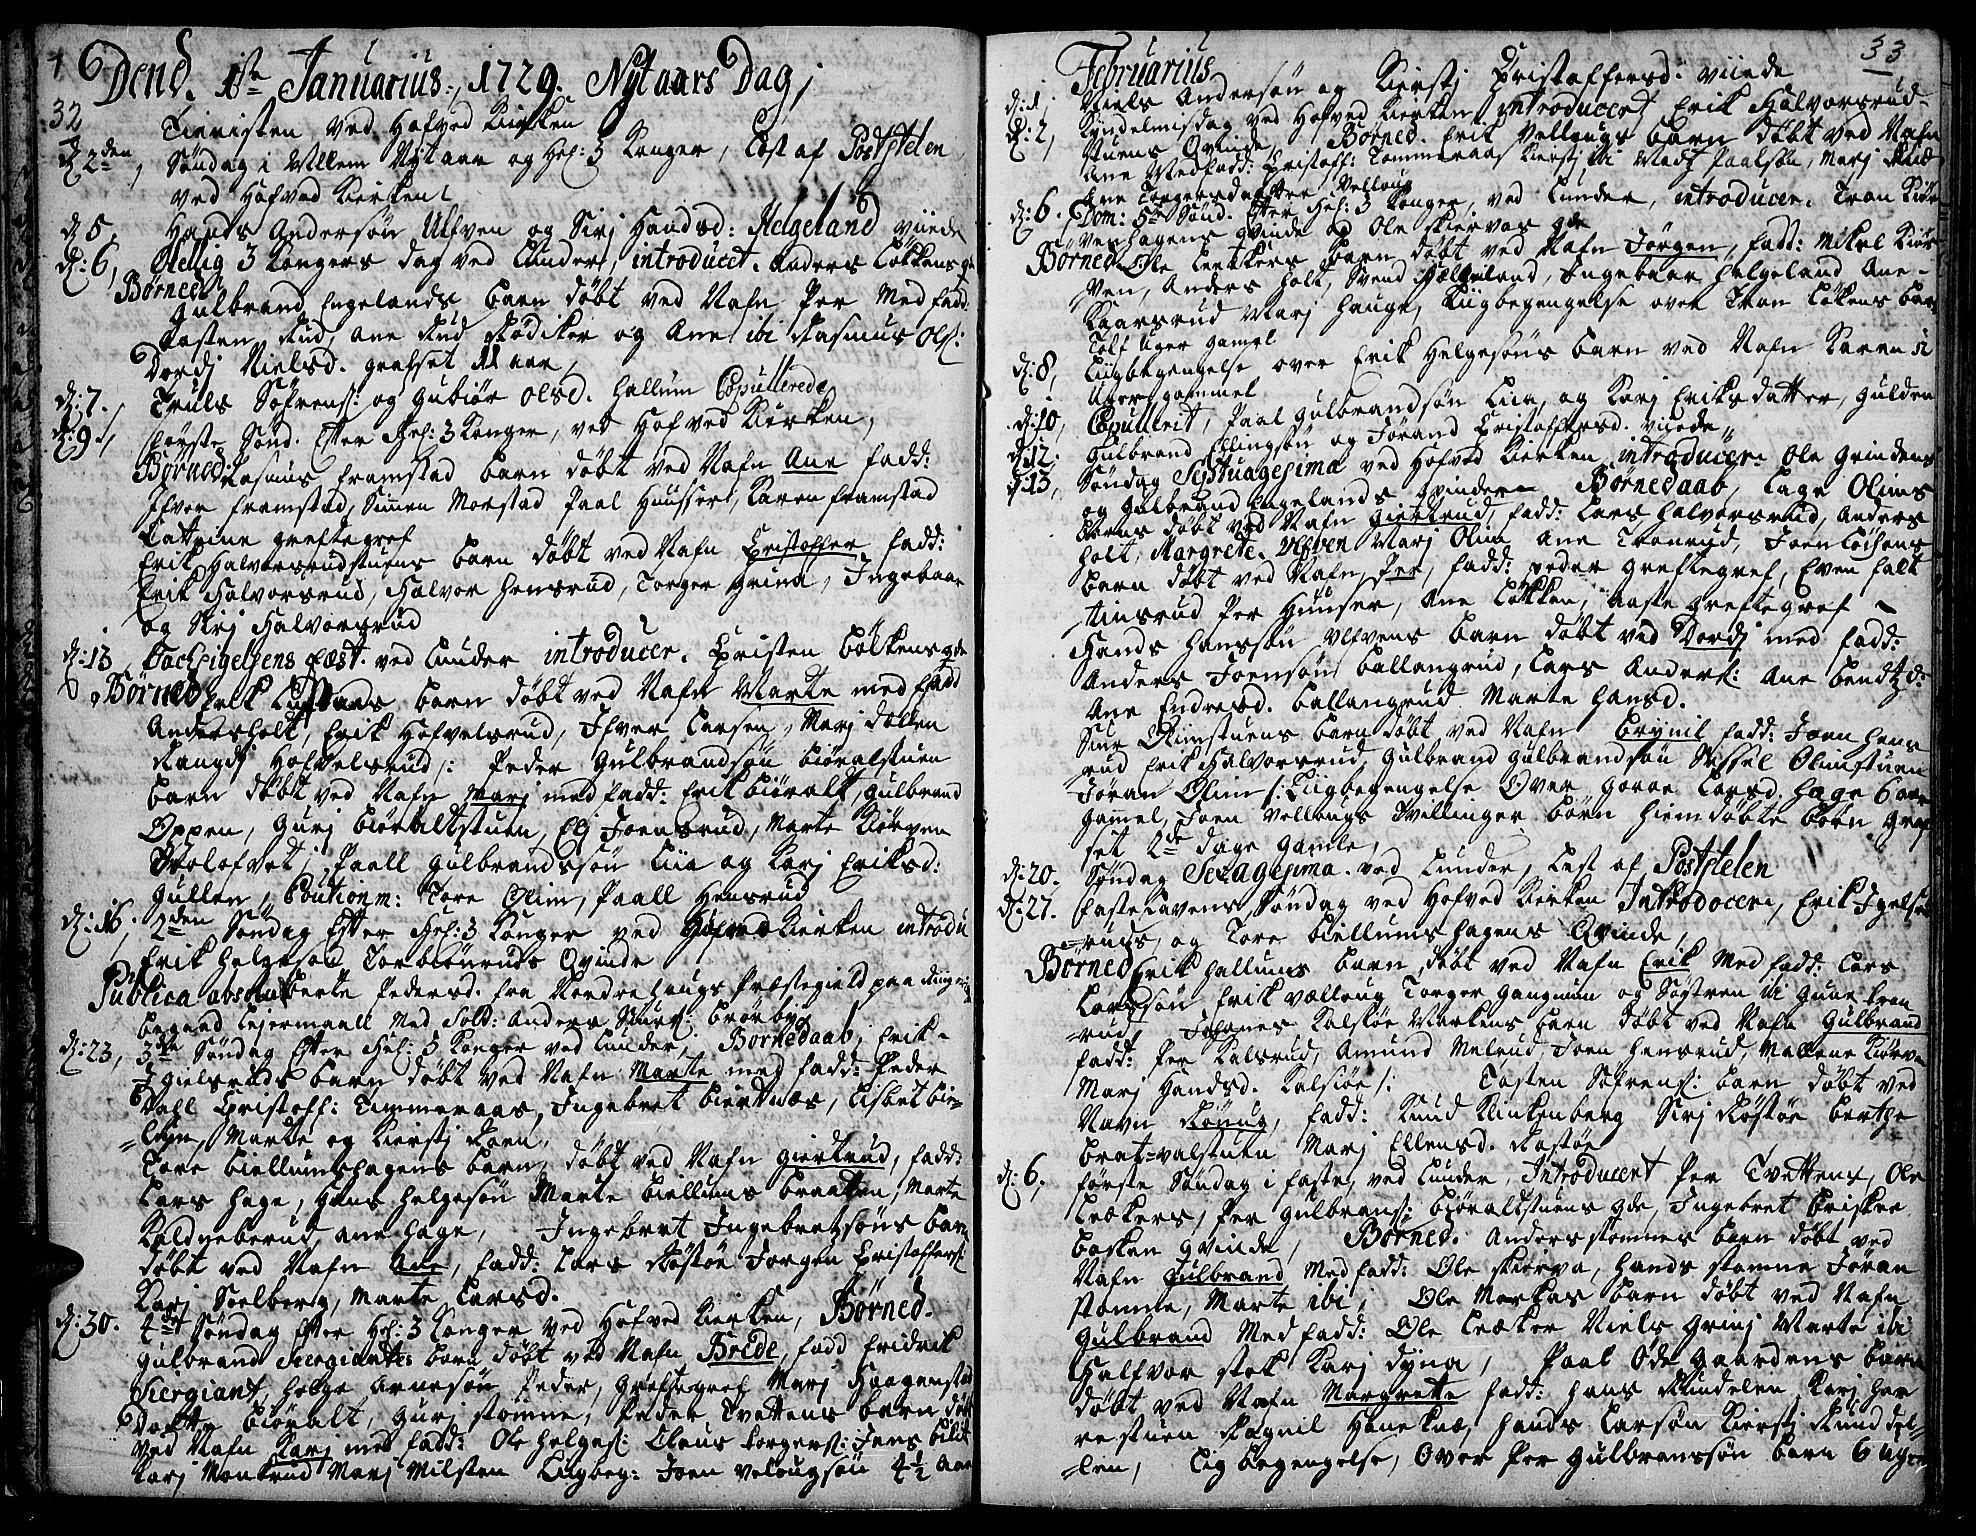 SAH, Jevnaker prestekontor, Ministerialbok nr. 2, 1725-1751, s. 32-33